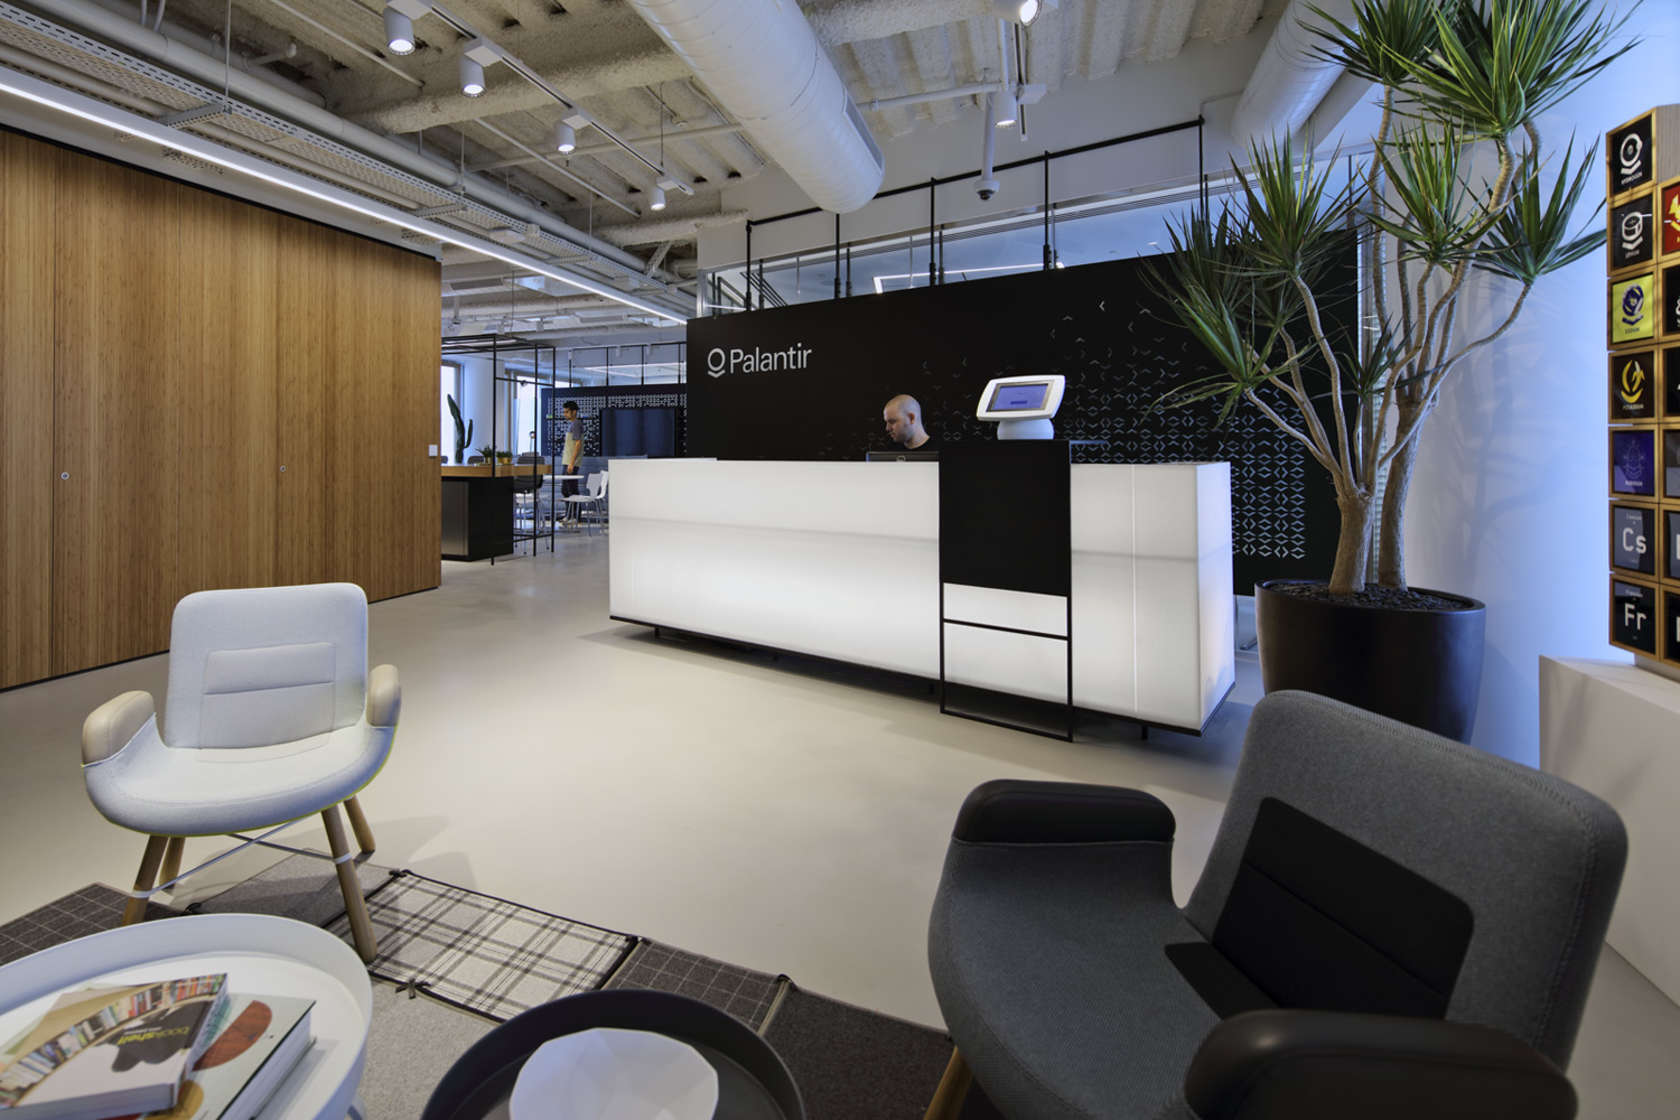 palantir-tel-aviv-office-5